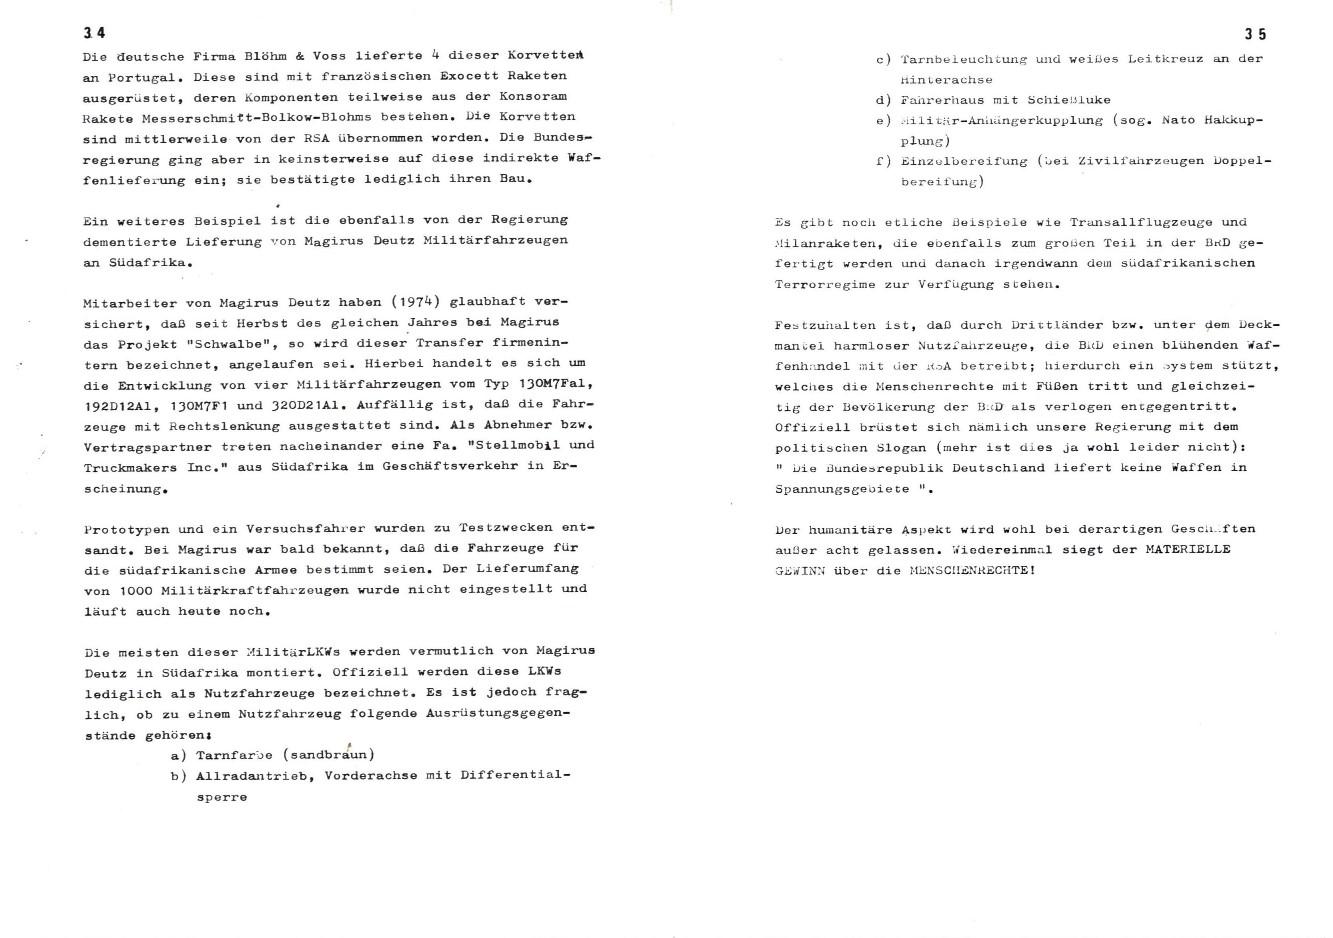 Muenster_AKAFRIK_1981_Suedafrika_BRD_19